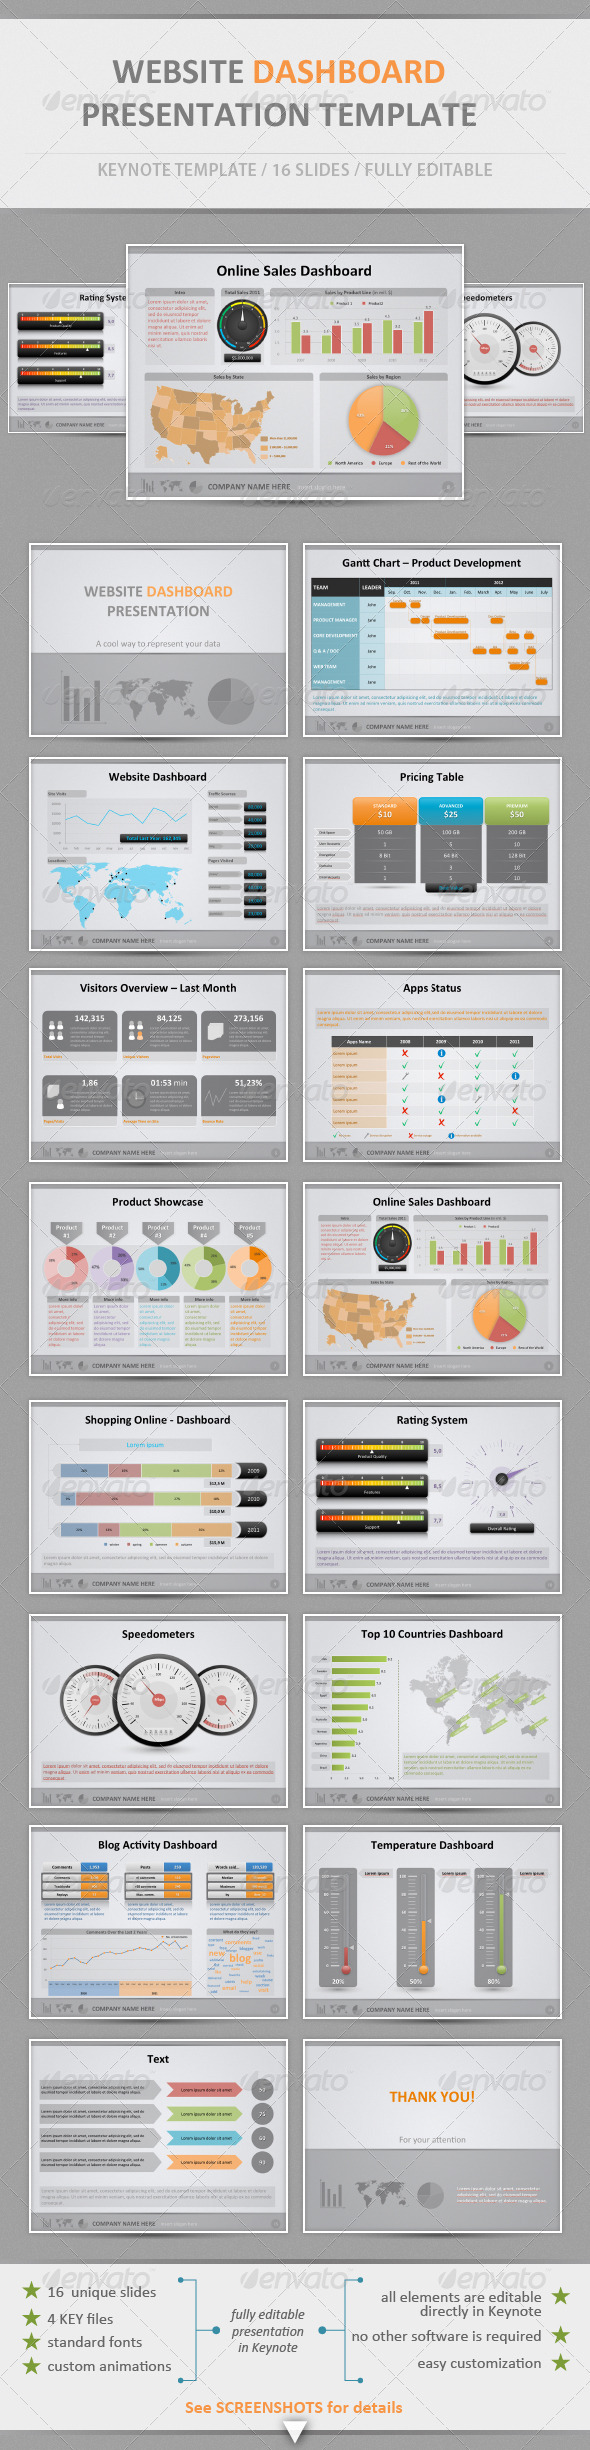 GraphicRiver Website Dashboard Presentation Template 2103253